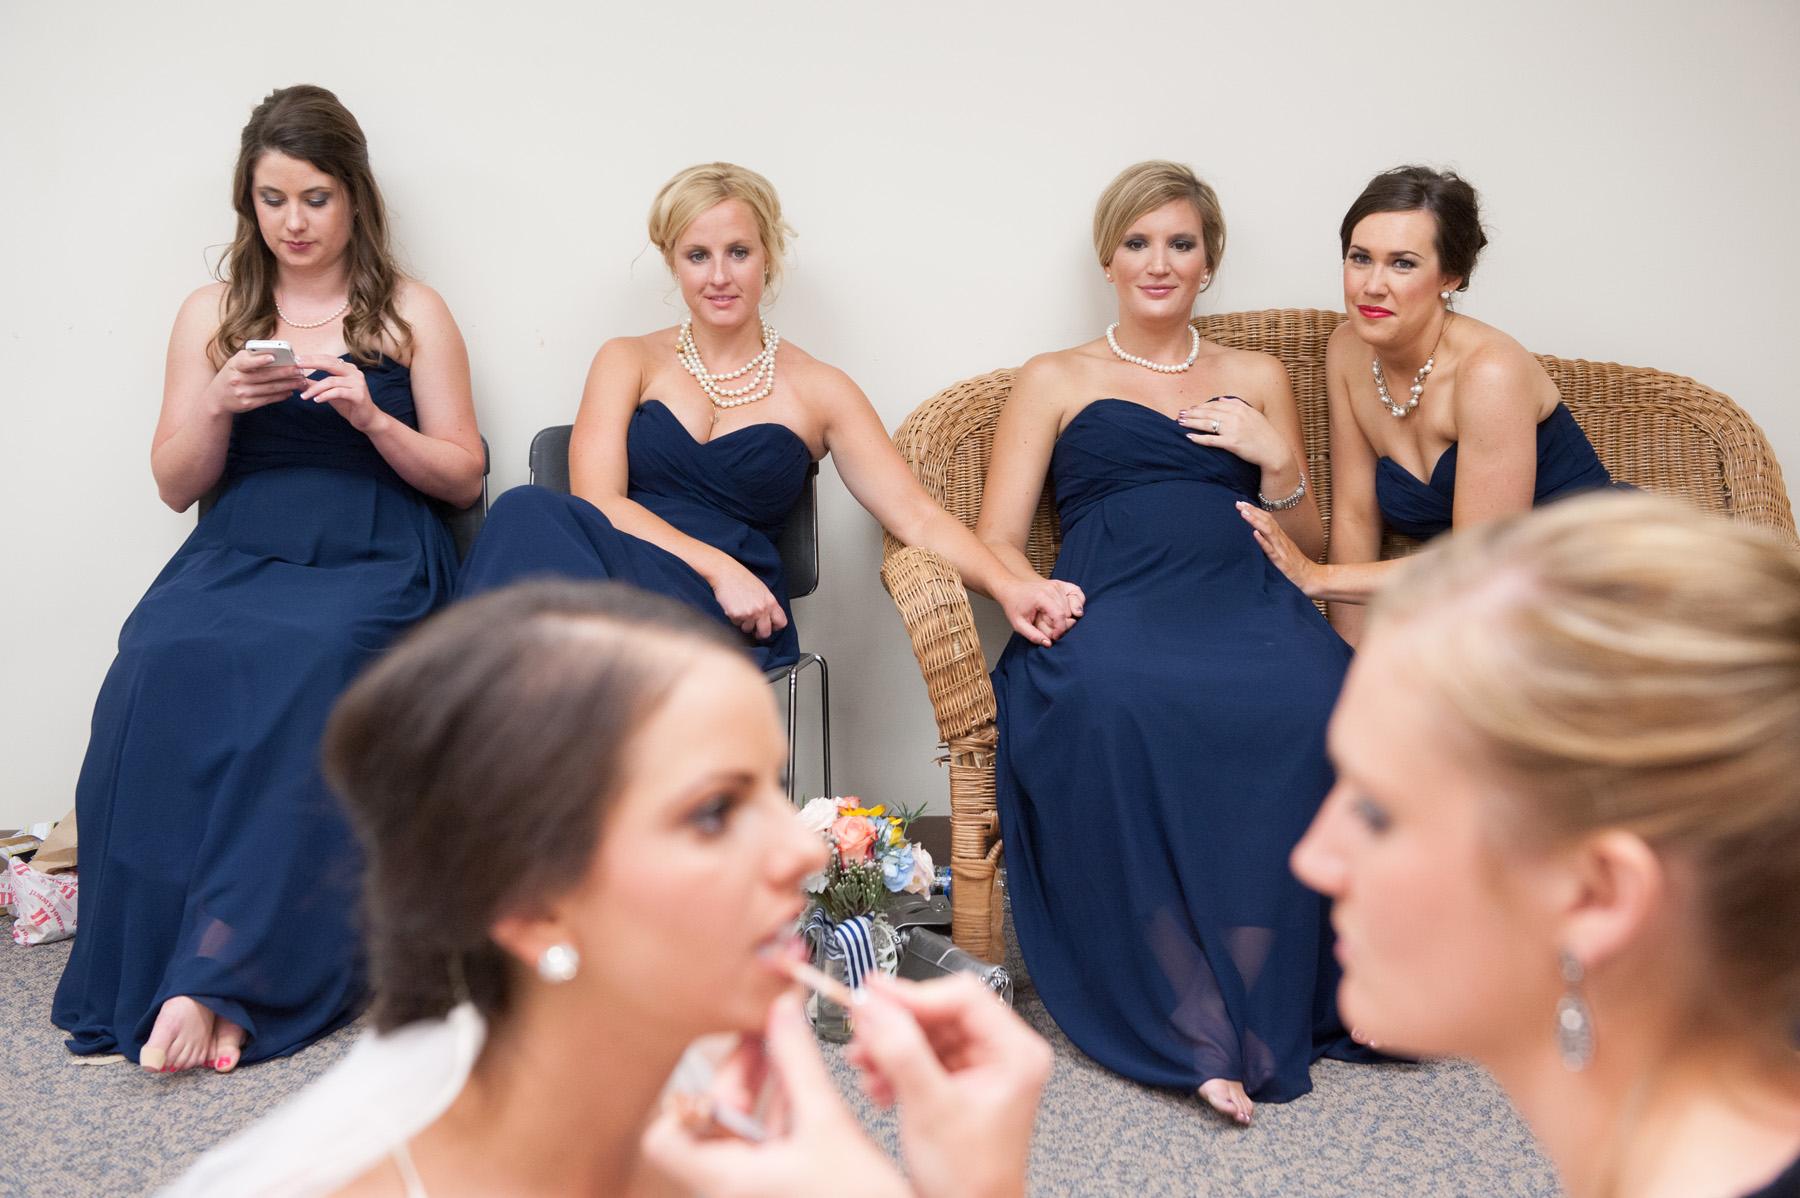 minneapolis-wedding-photography-mark-kegans-321.jpg